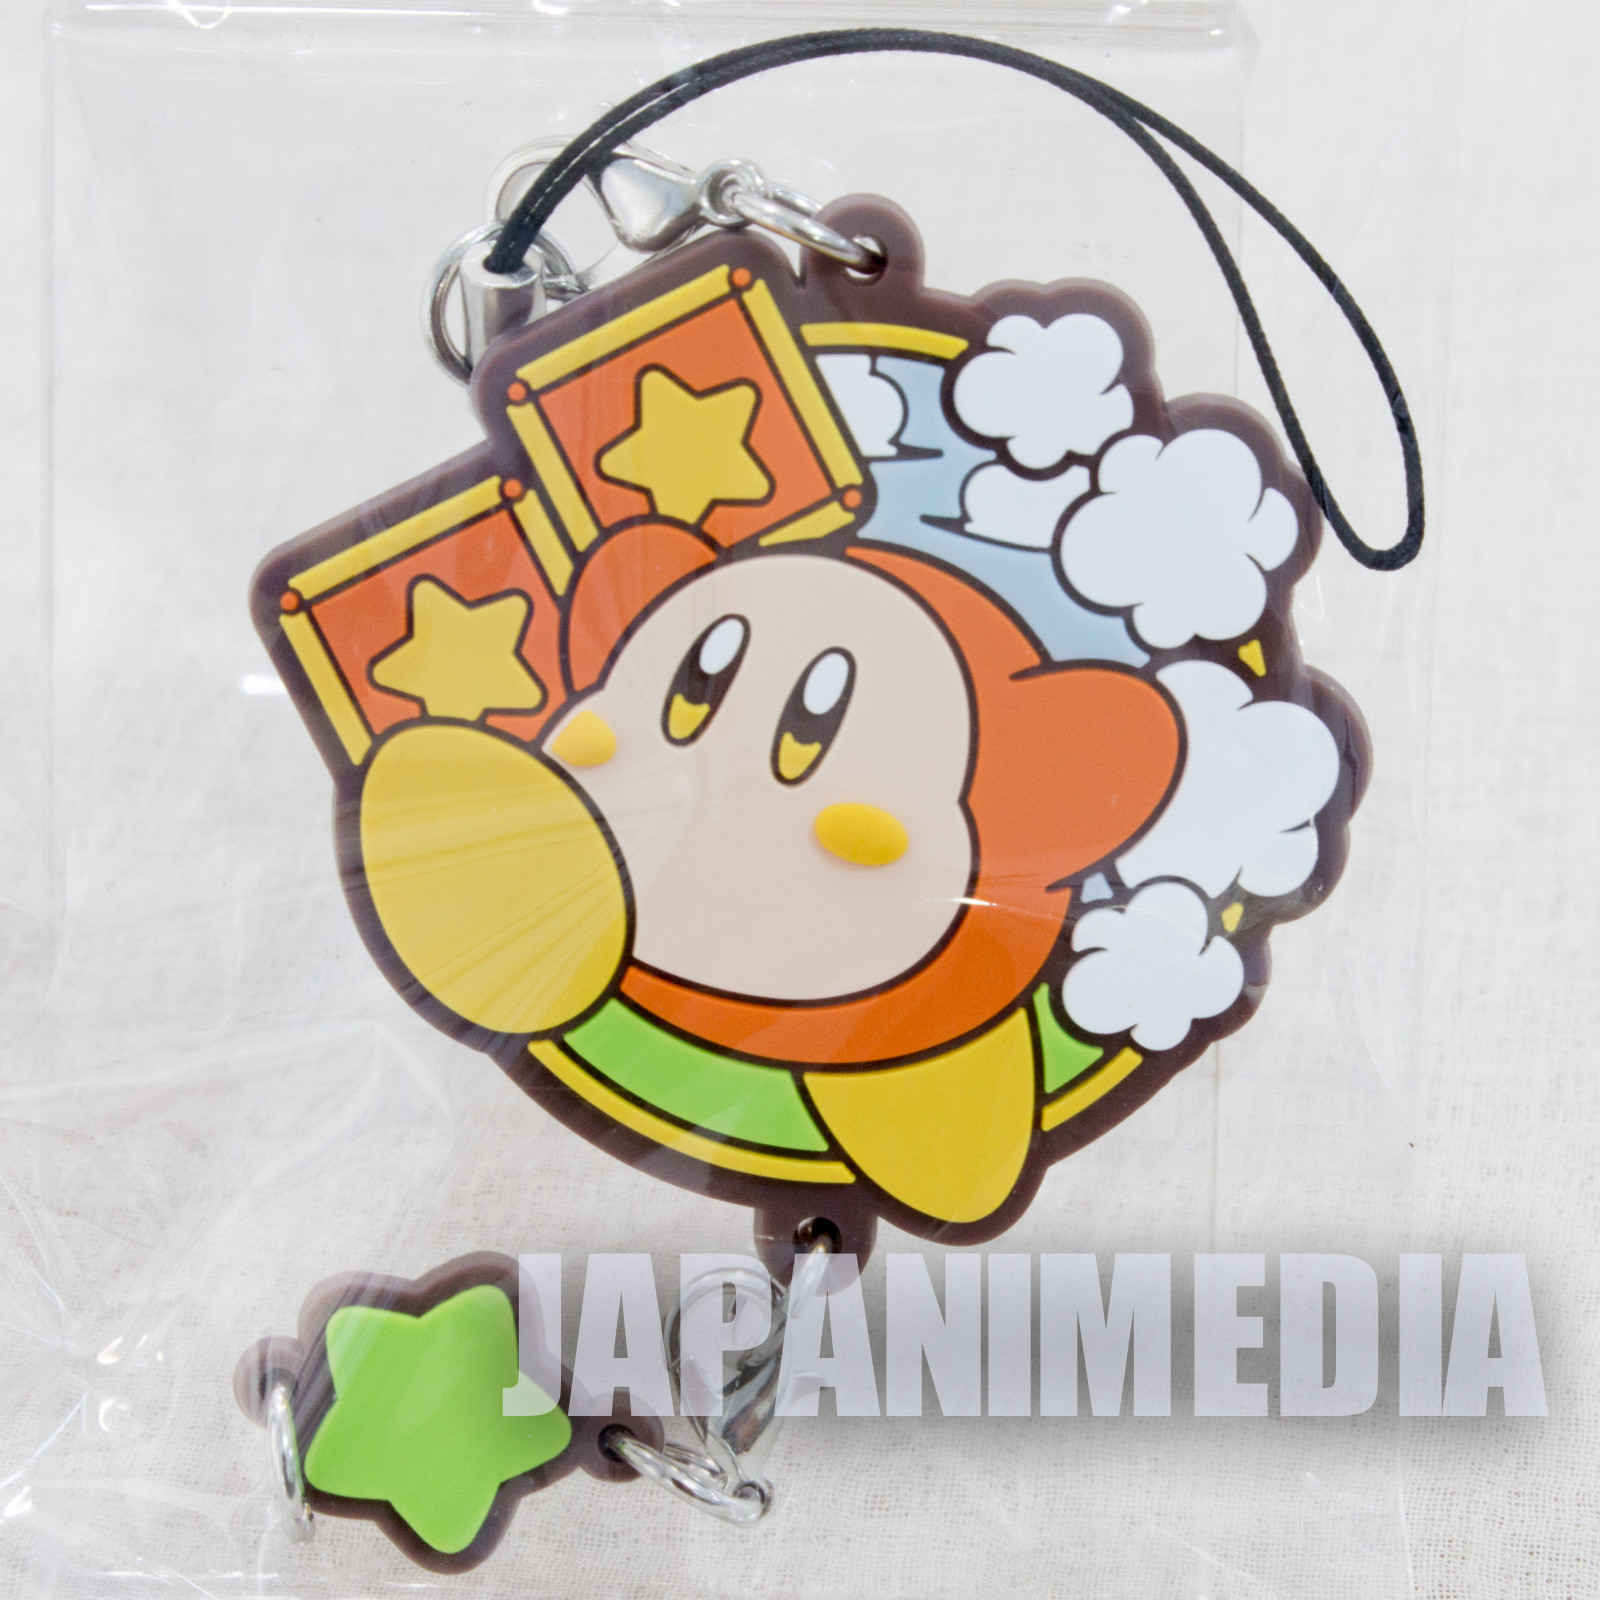 Kirby Super Star Mascot Rubber Strap Waddle Dee ver. Banpresto JAPAN NINTNEDO